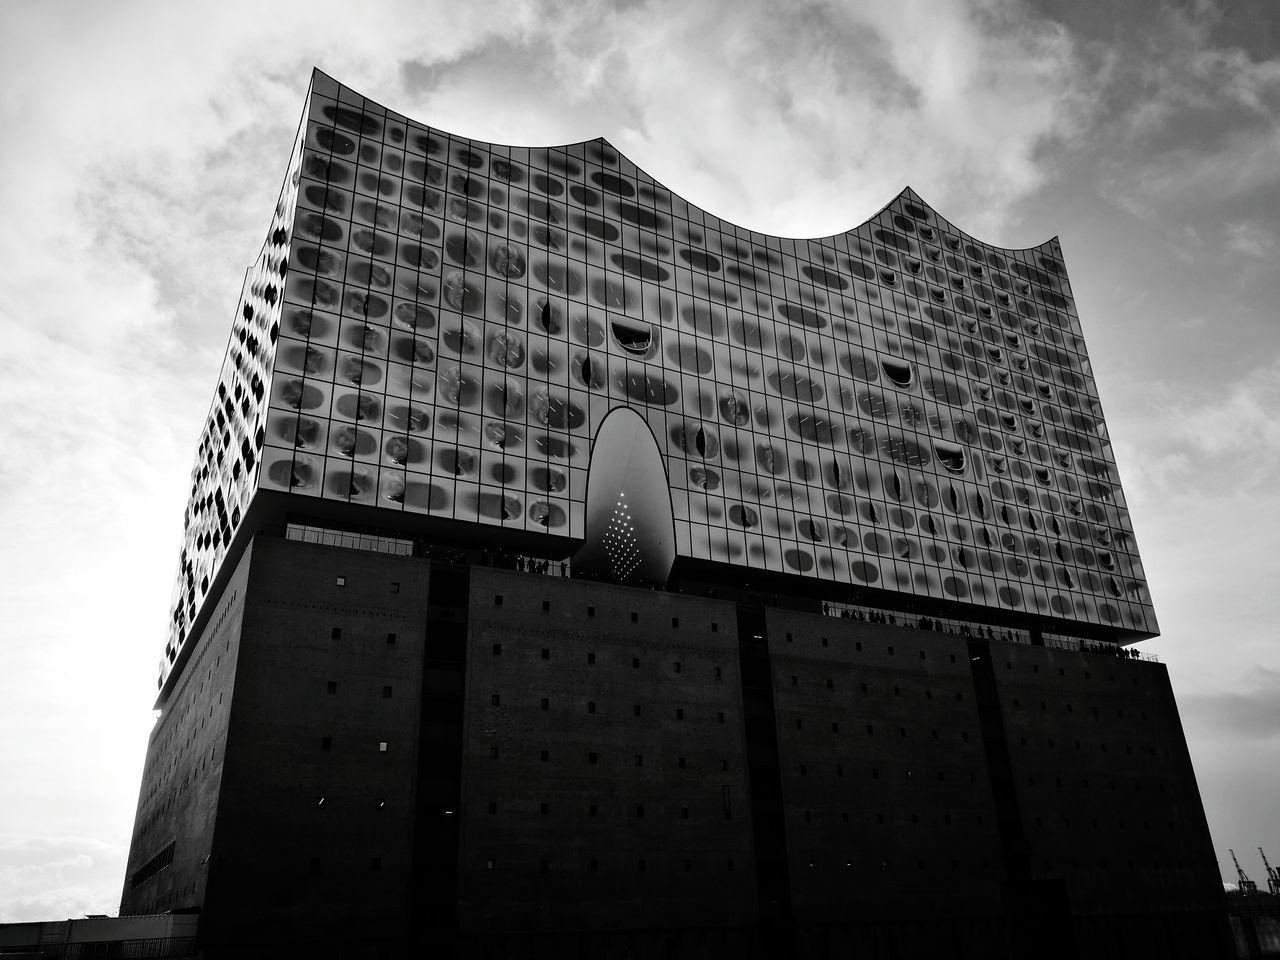 Elbphilharmonie City Travel Destinations Hamburg Harbour Hamburg Hafencity Architecture Blackandwhite Loveit Impressive Locations